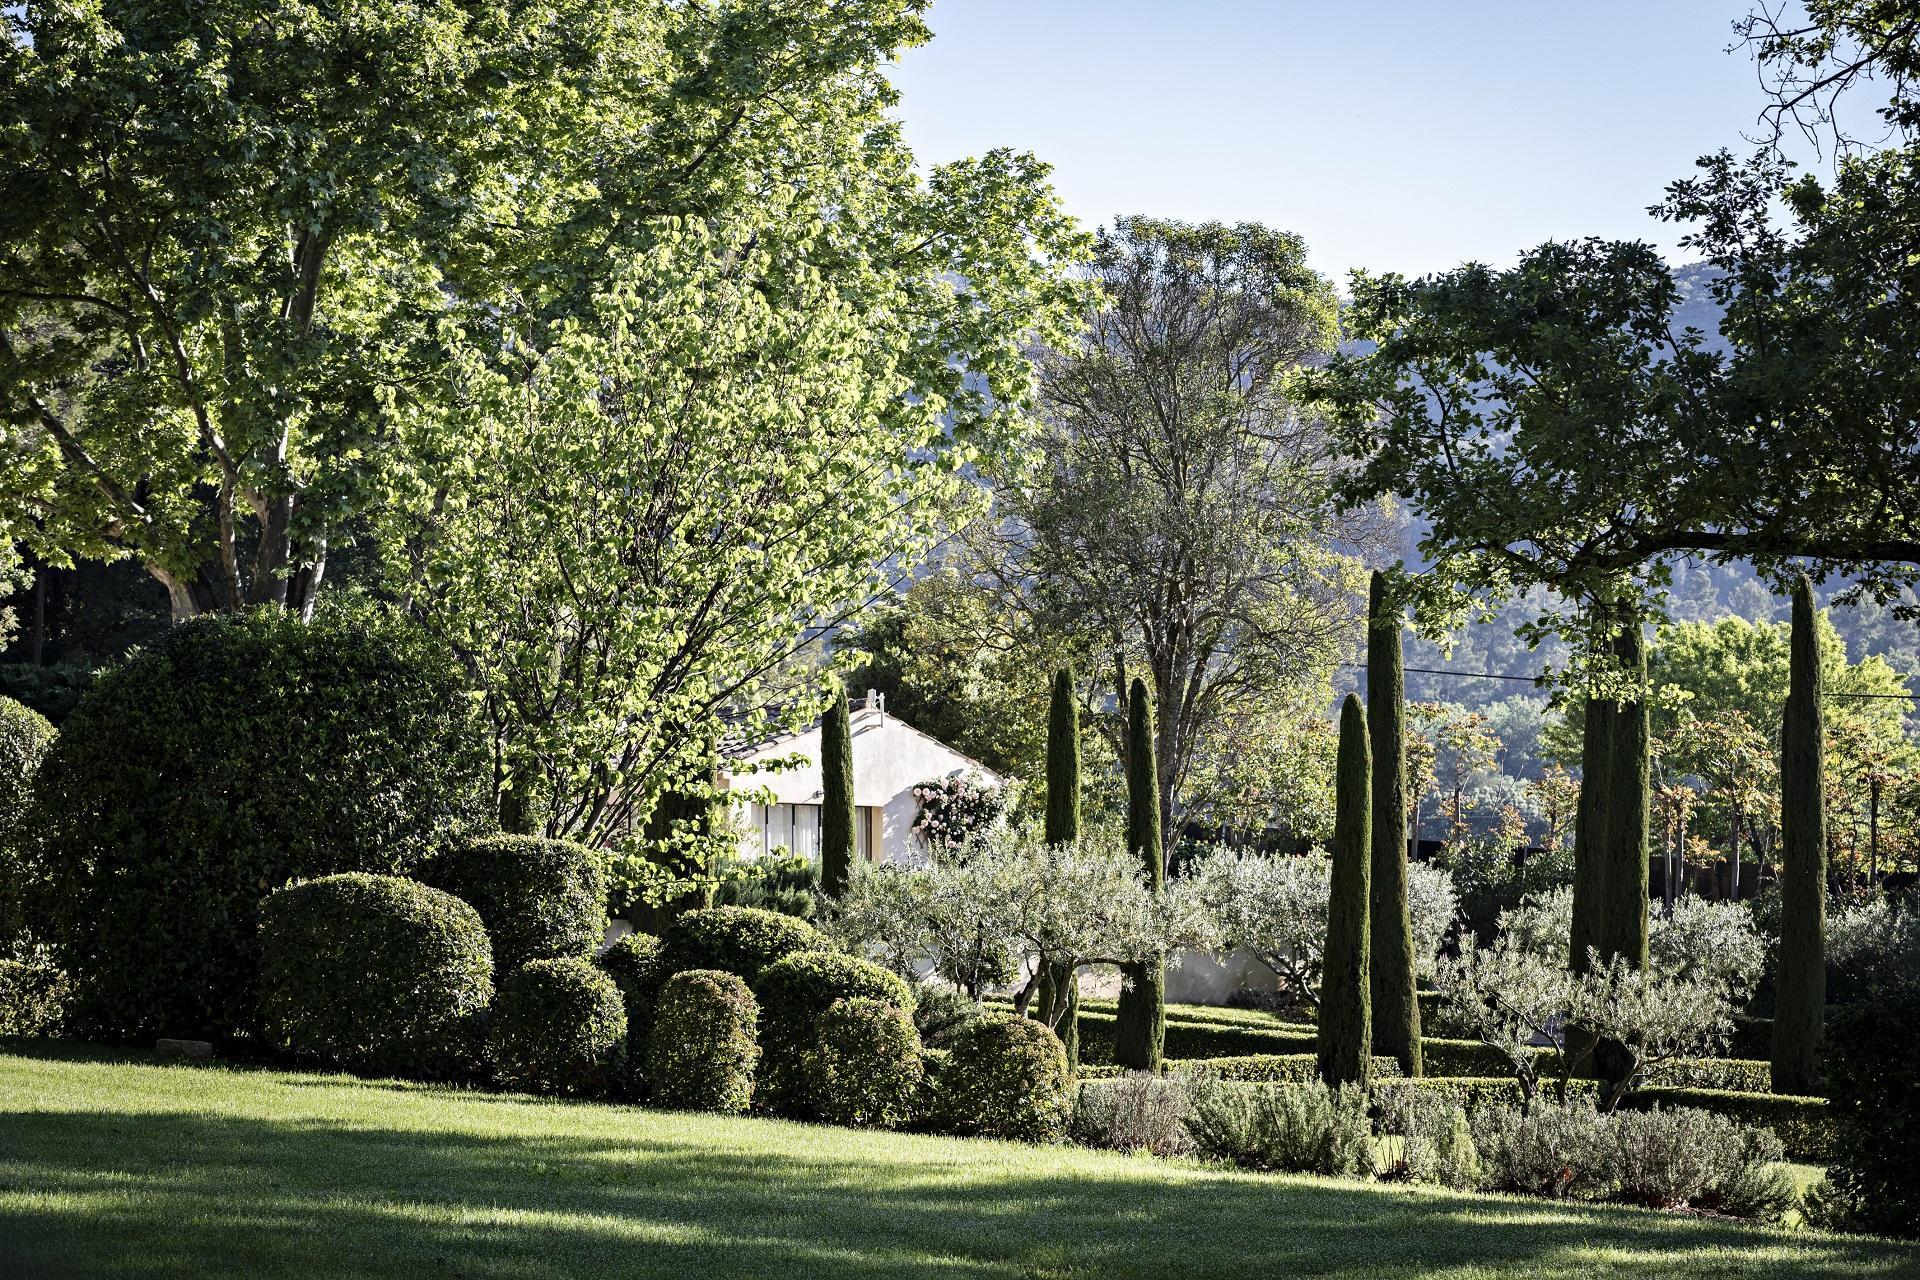 domaine-de-fontenille-luberon-provence-jardins-seminaires-de-caractere